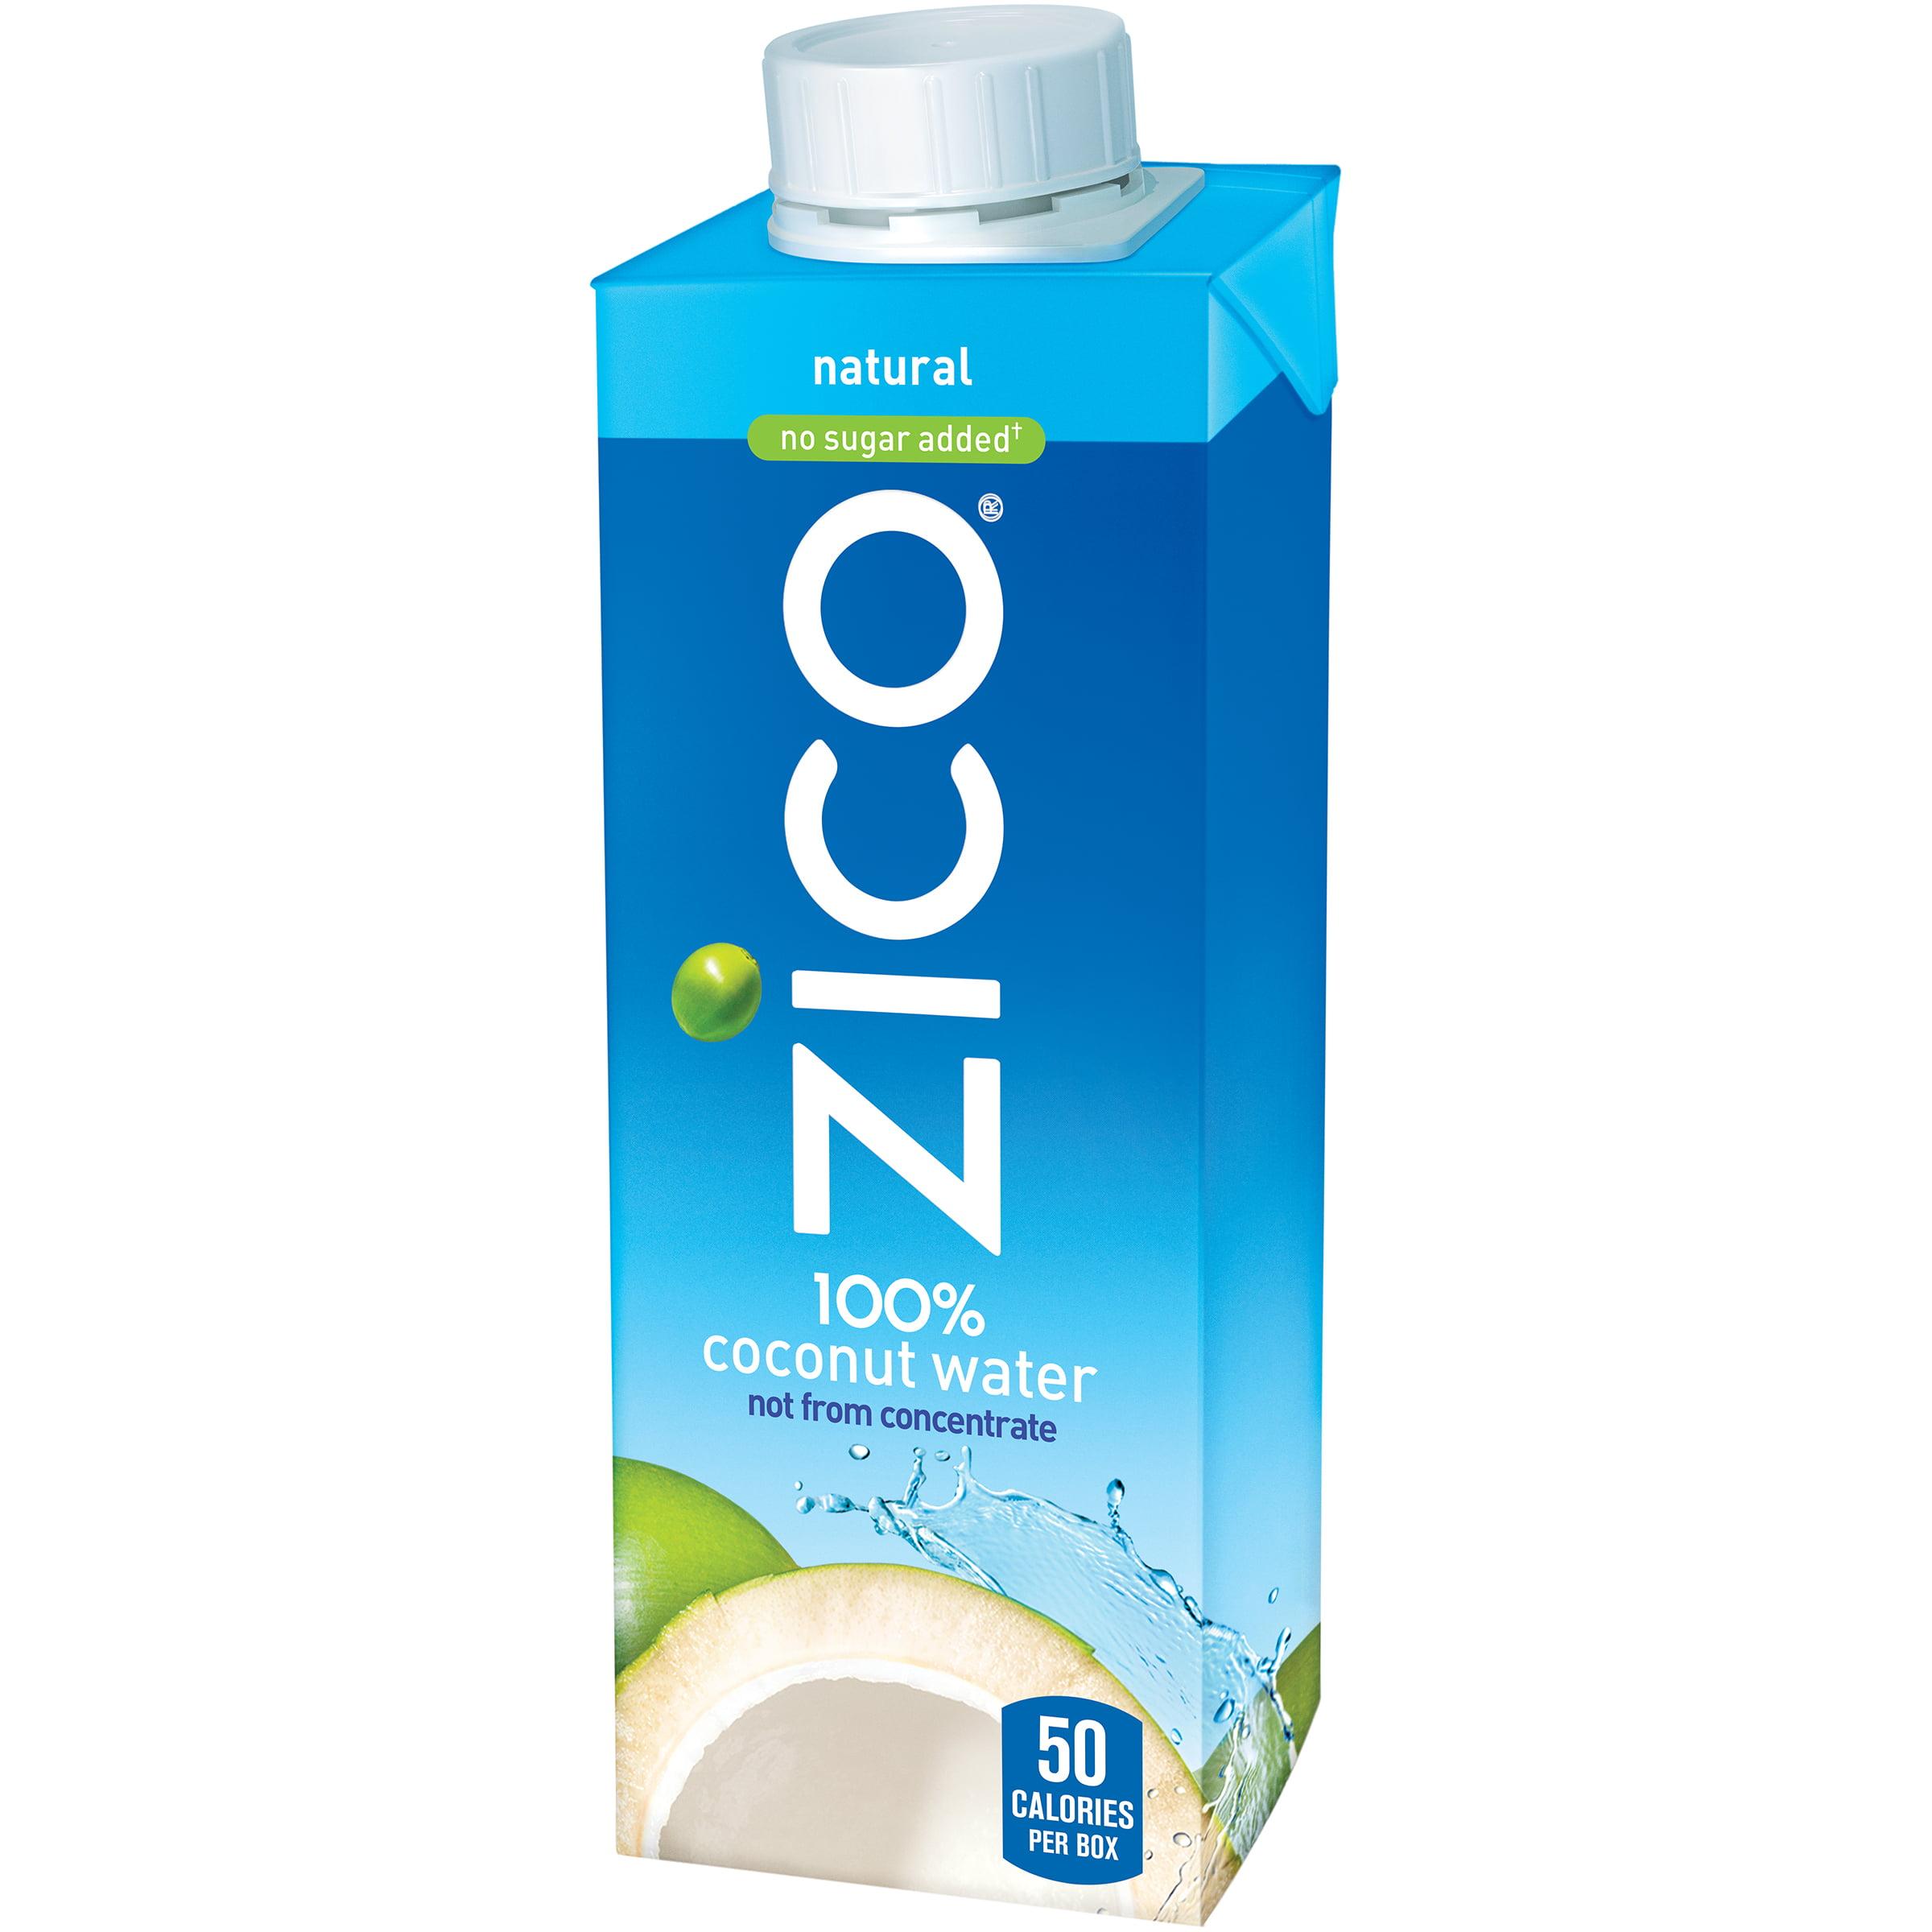 ZICO Premium 100% Coconut Water, 8.45 fl oz